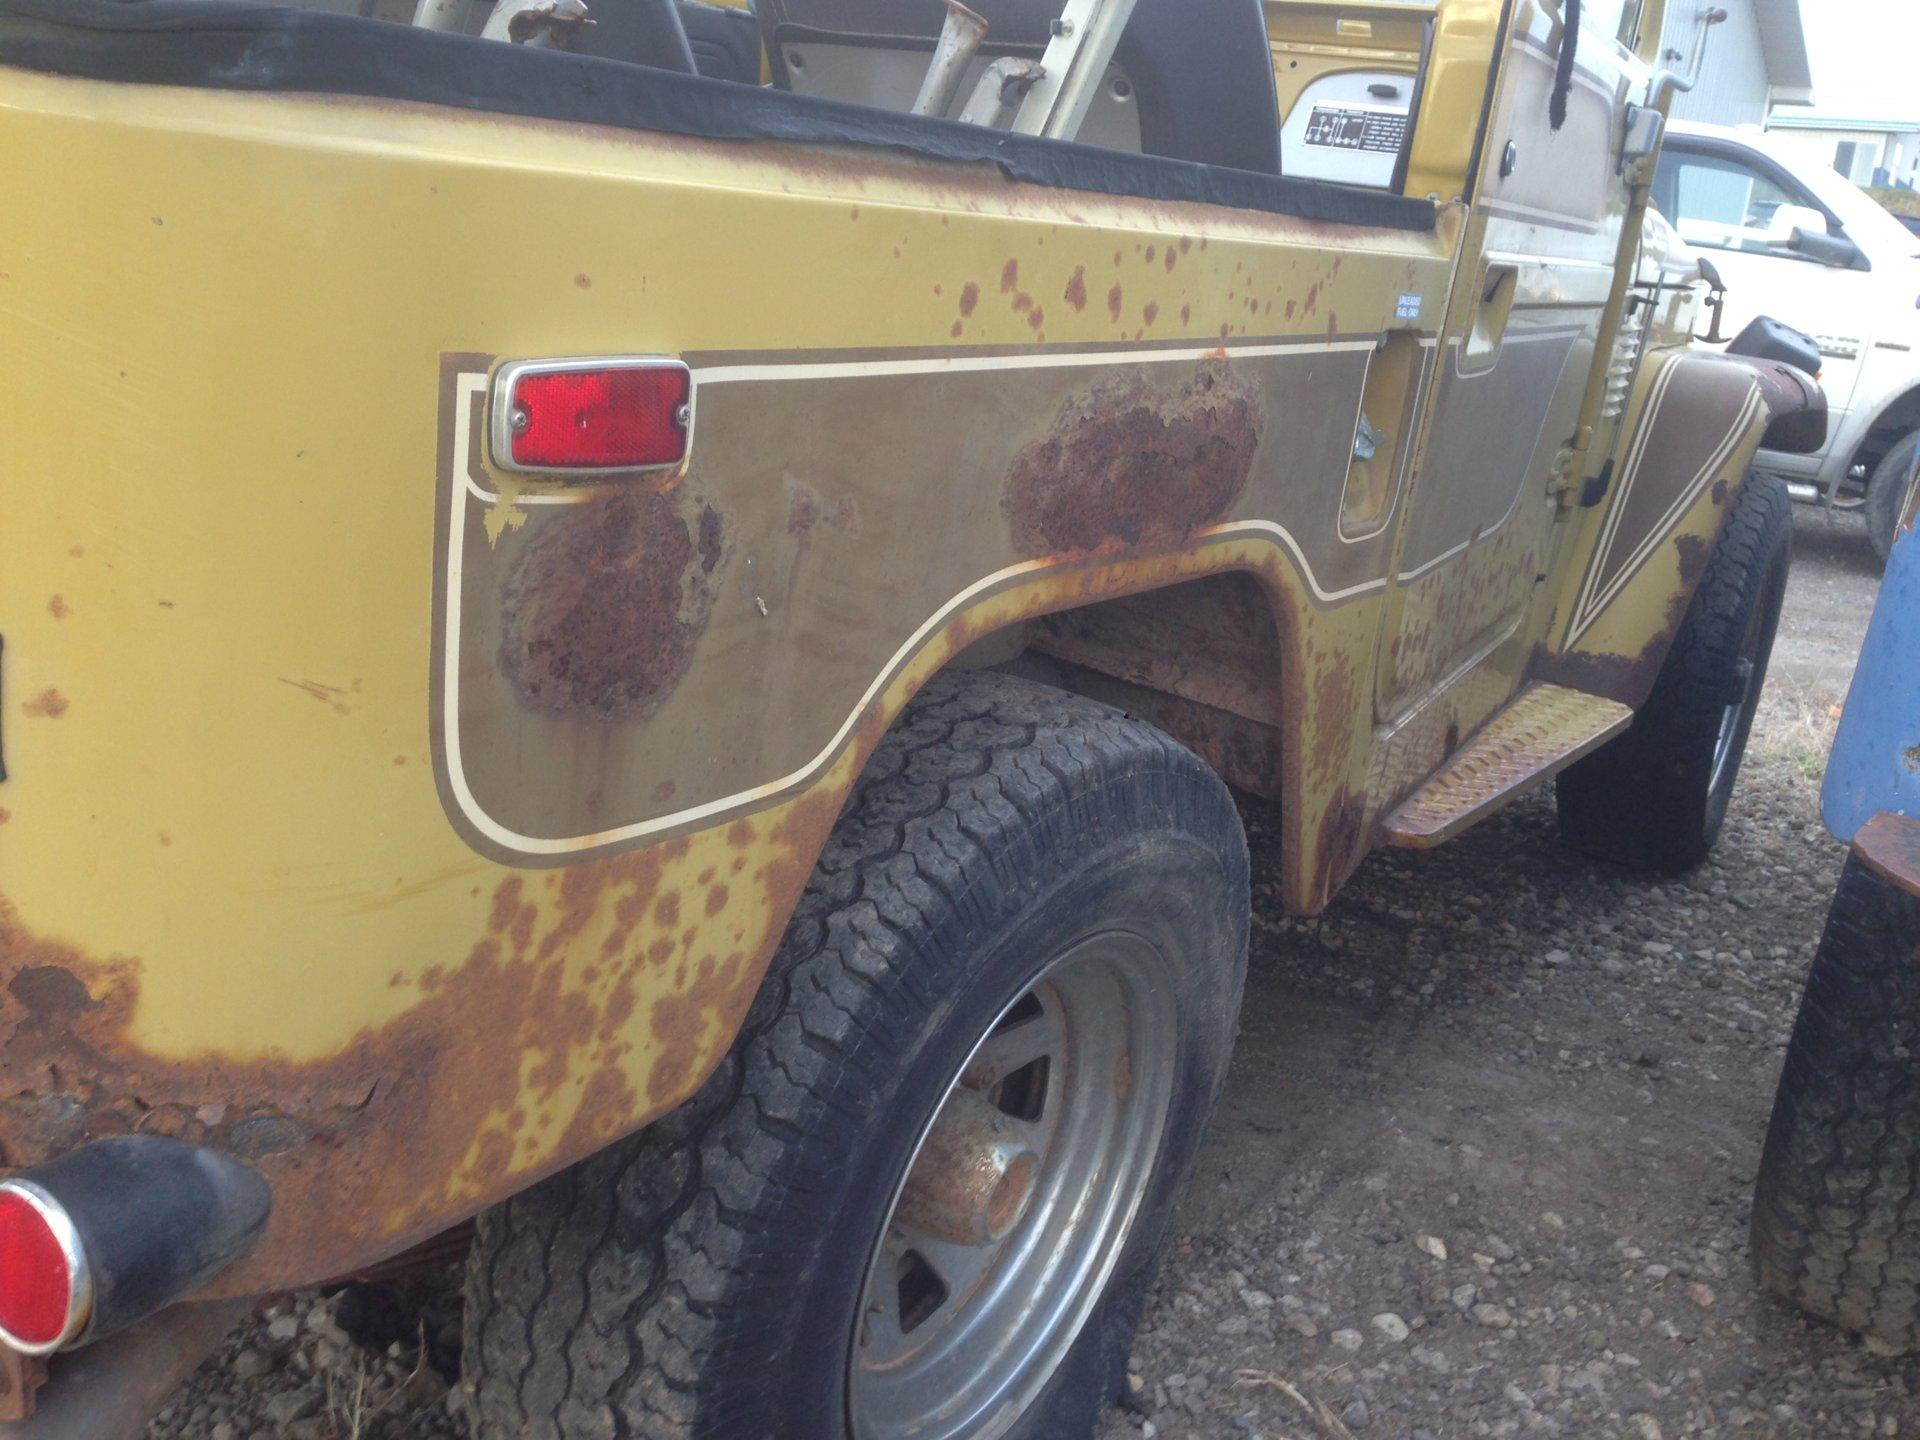 For Sale - '77 FJ40, original paint, $4000 WY | IH8MUD Forum